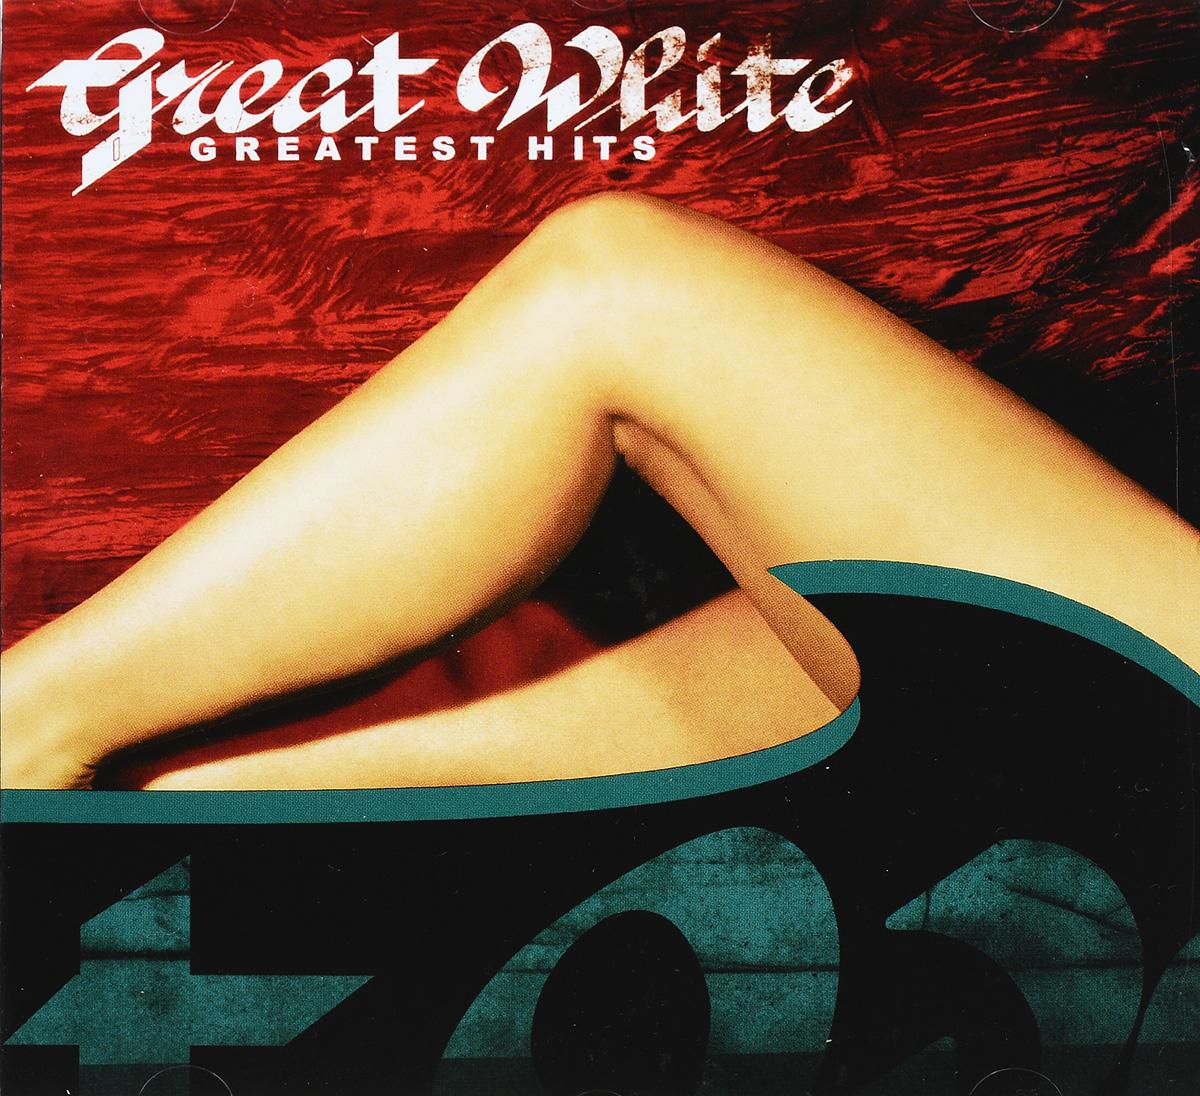 GREAT WHITE. GREATEST HITS atomic kitten greatest hits